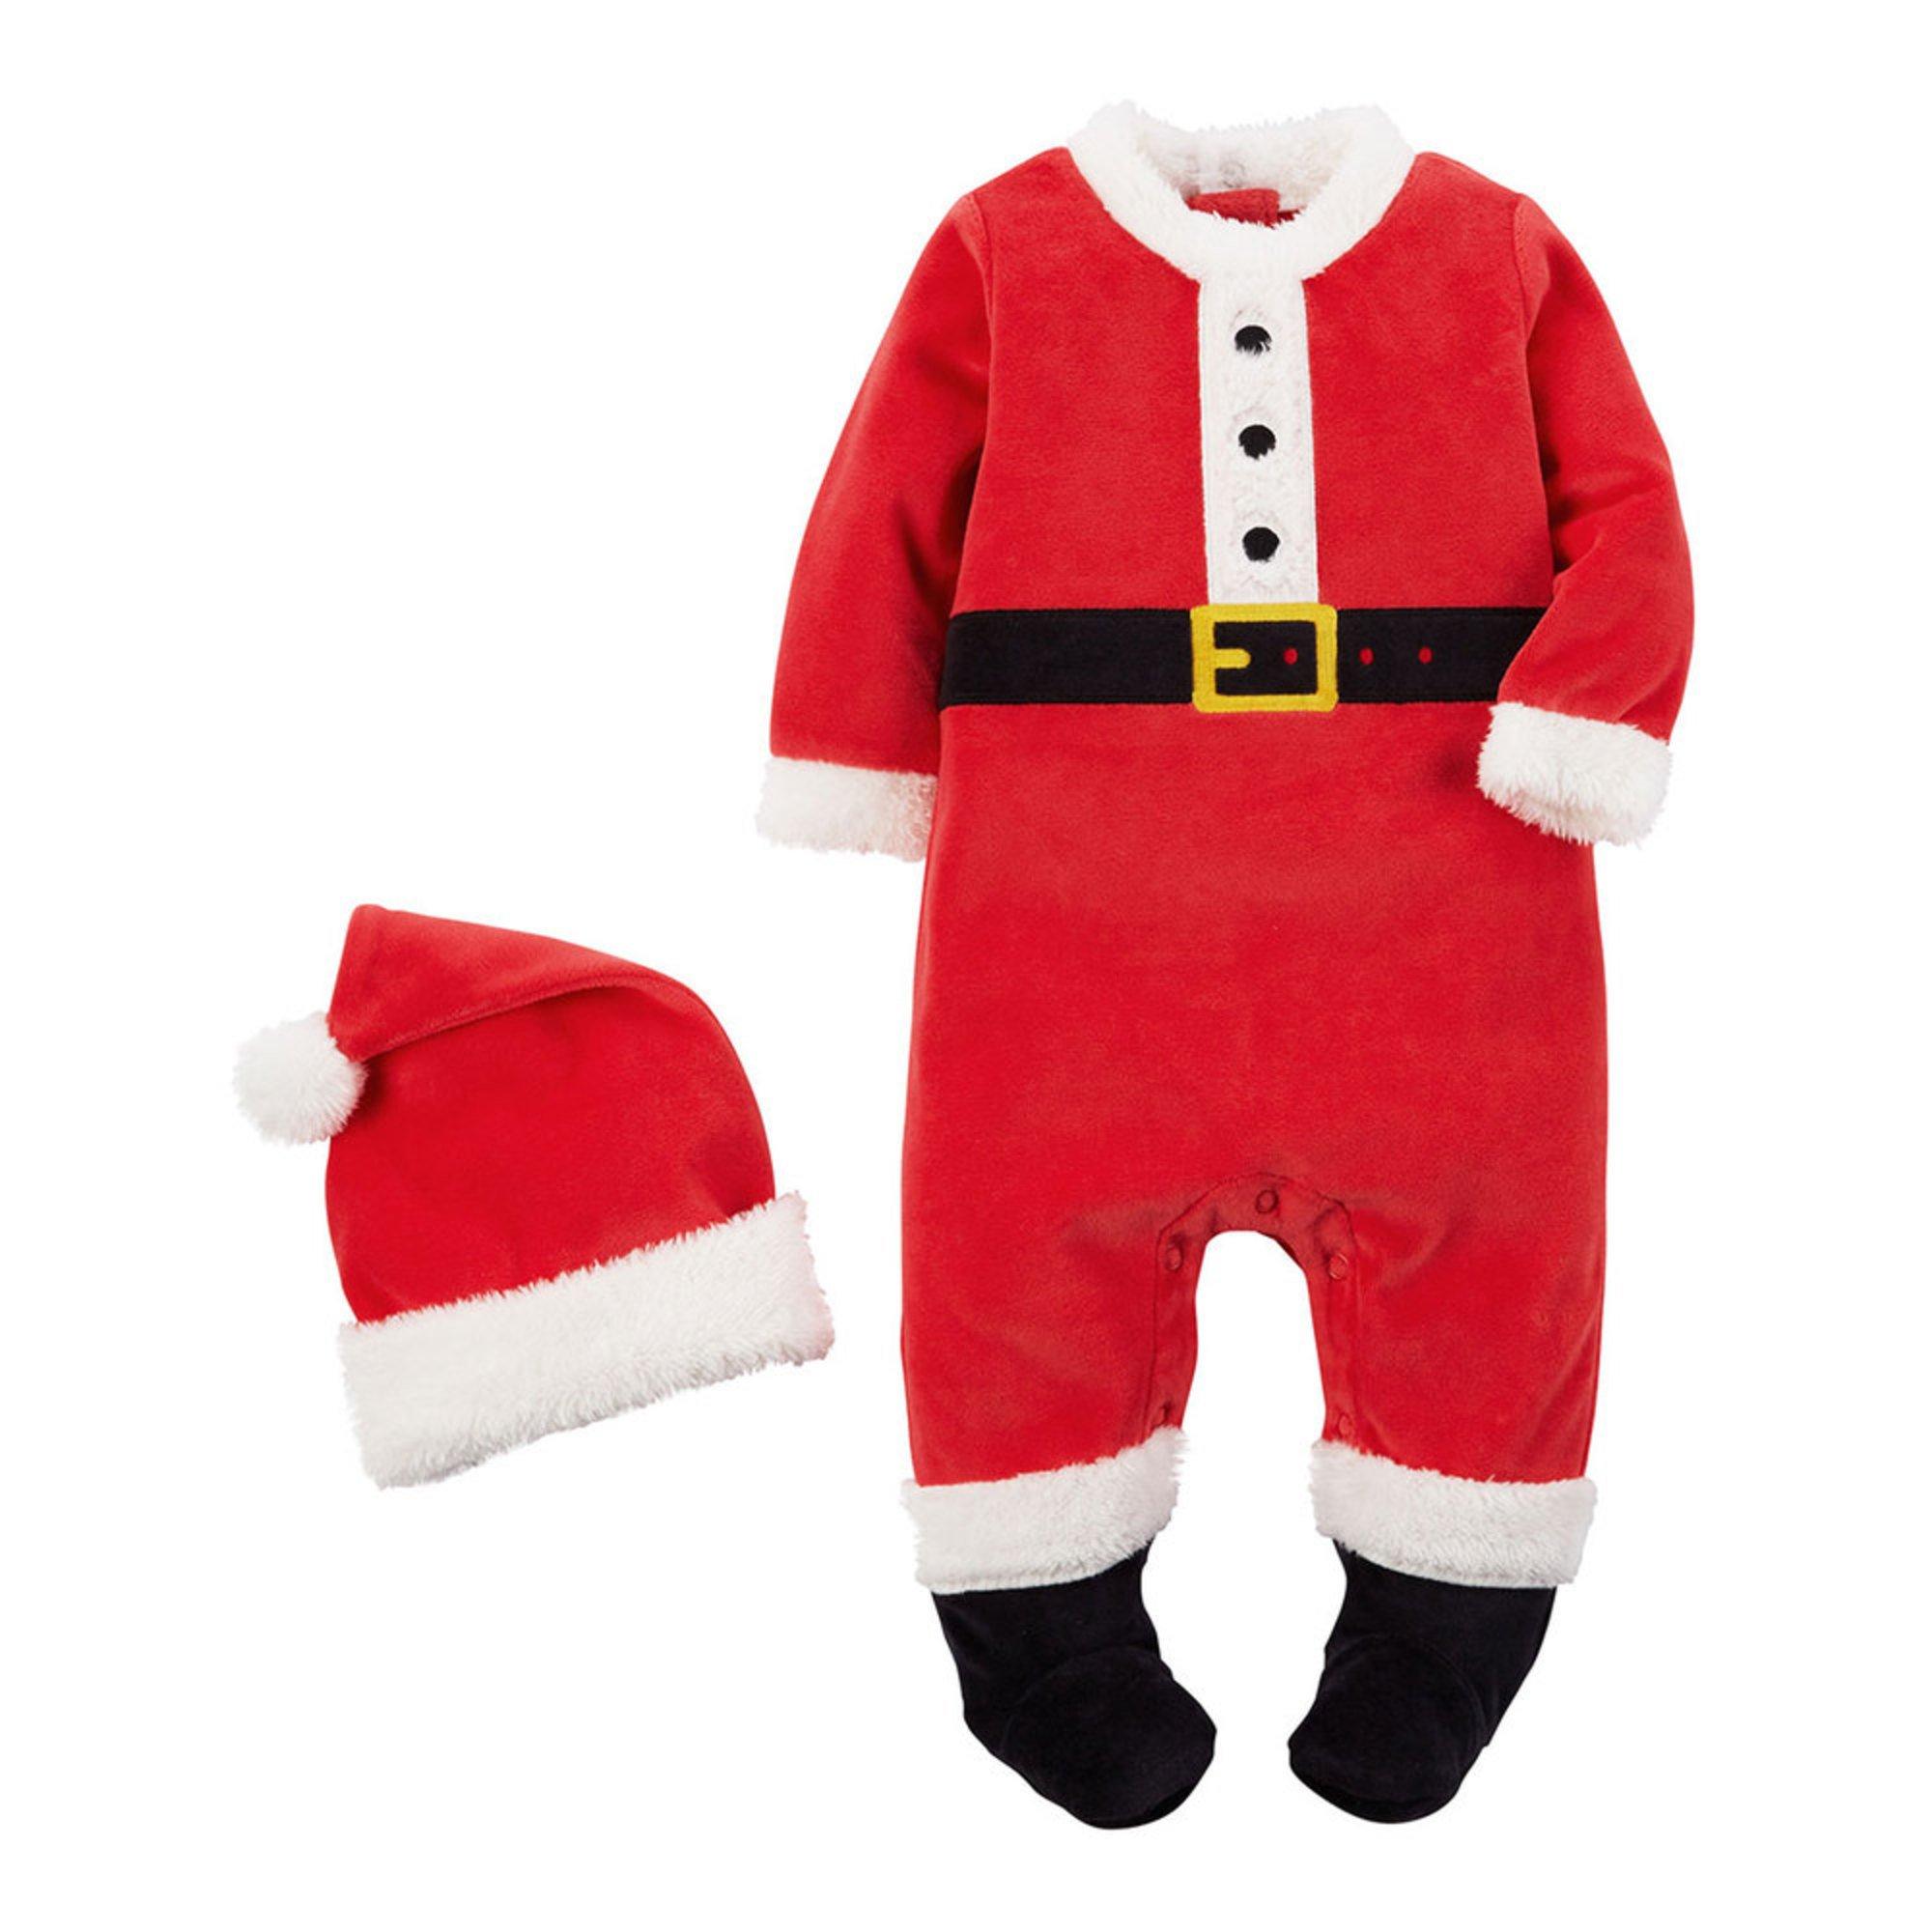 Carter's Newborn 2-piece Velour Sleep N Play, Santa Suit ...